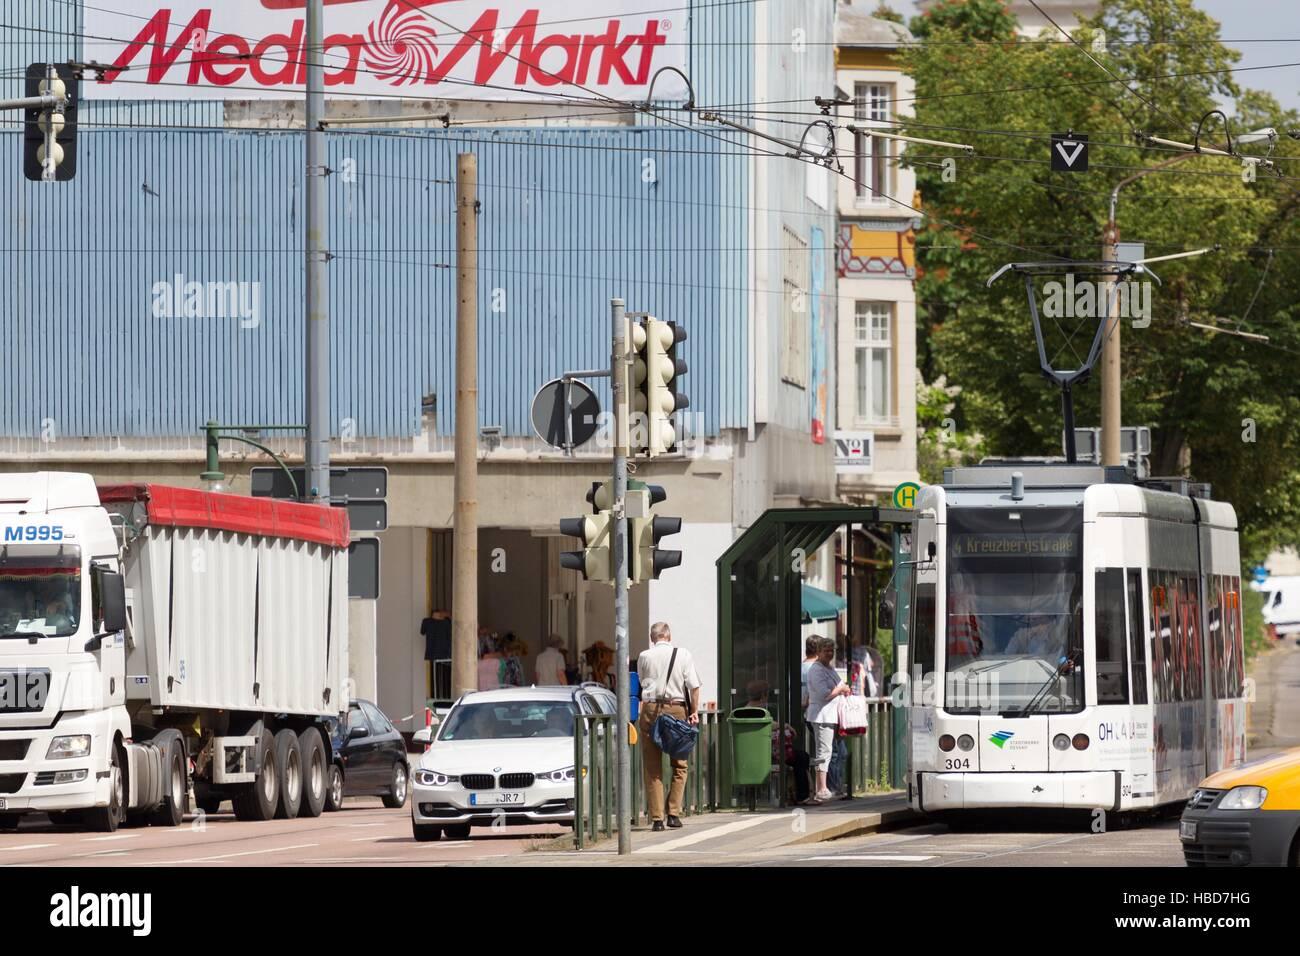 Dessau: Straßenbahn zur Kreuzberg-Straße Stockfoto